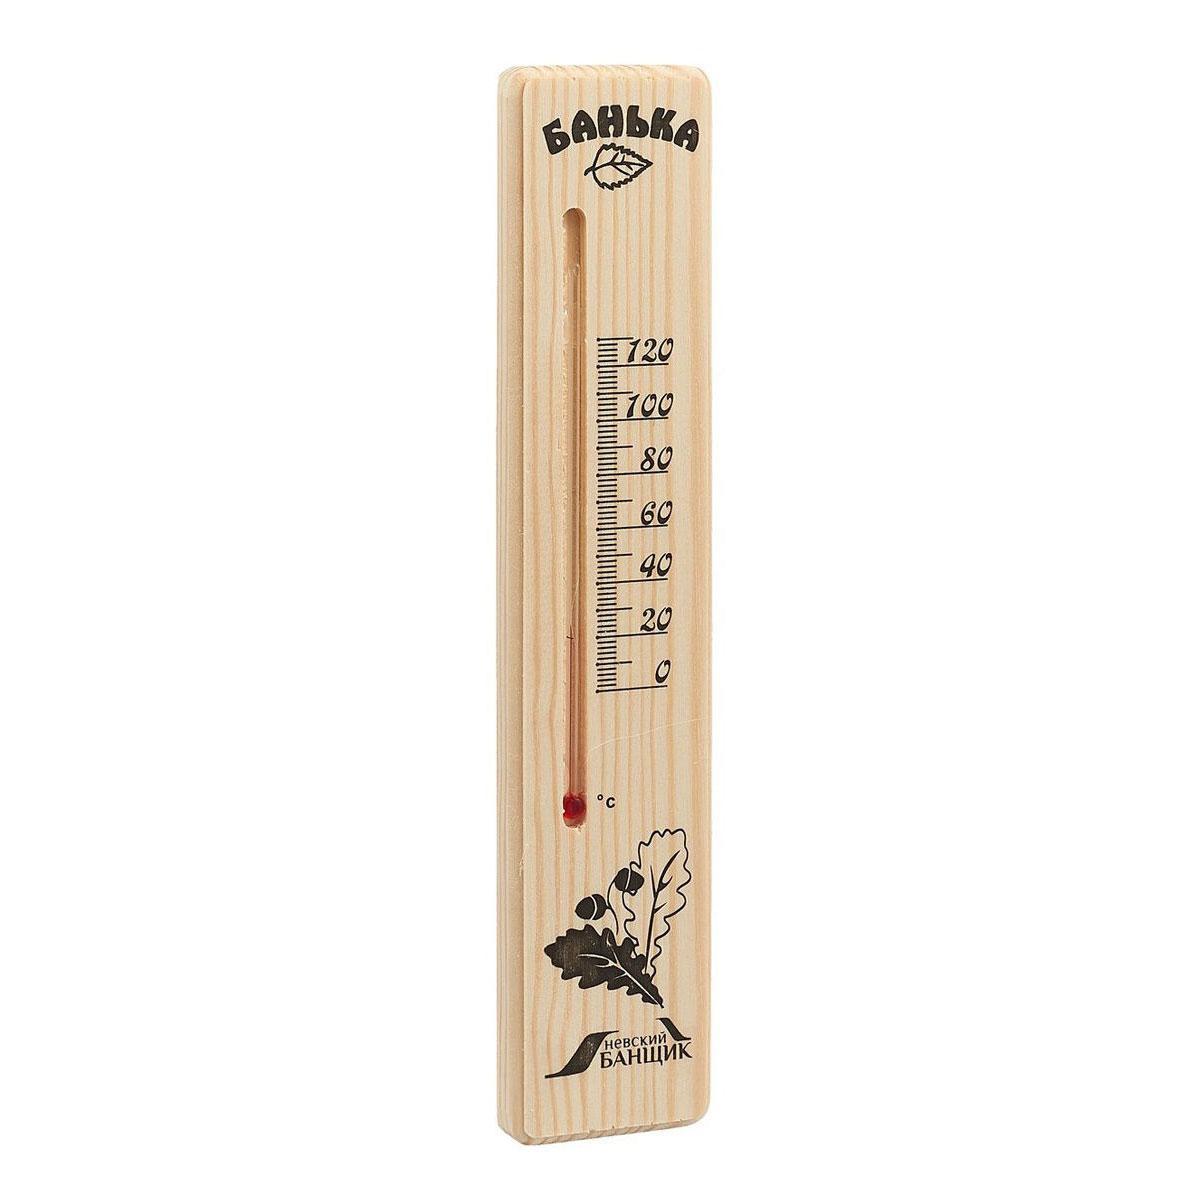 "Жидкостный термометр для бани ""Классика"", большой"